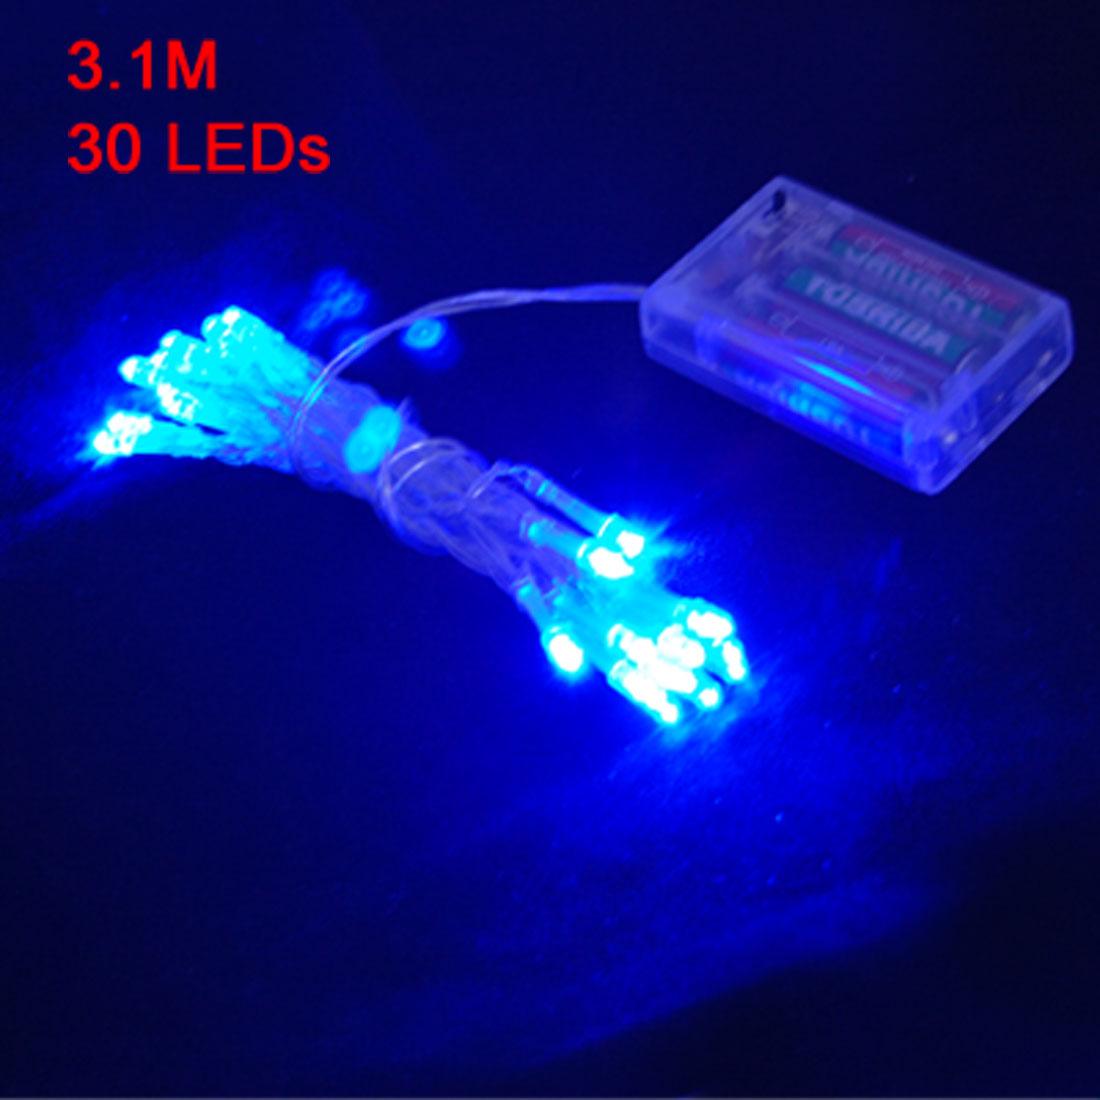 Wedding Xmas Blue 30 LEDs String Battery Light Lamp Decoration 3.1M